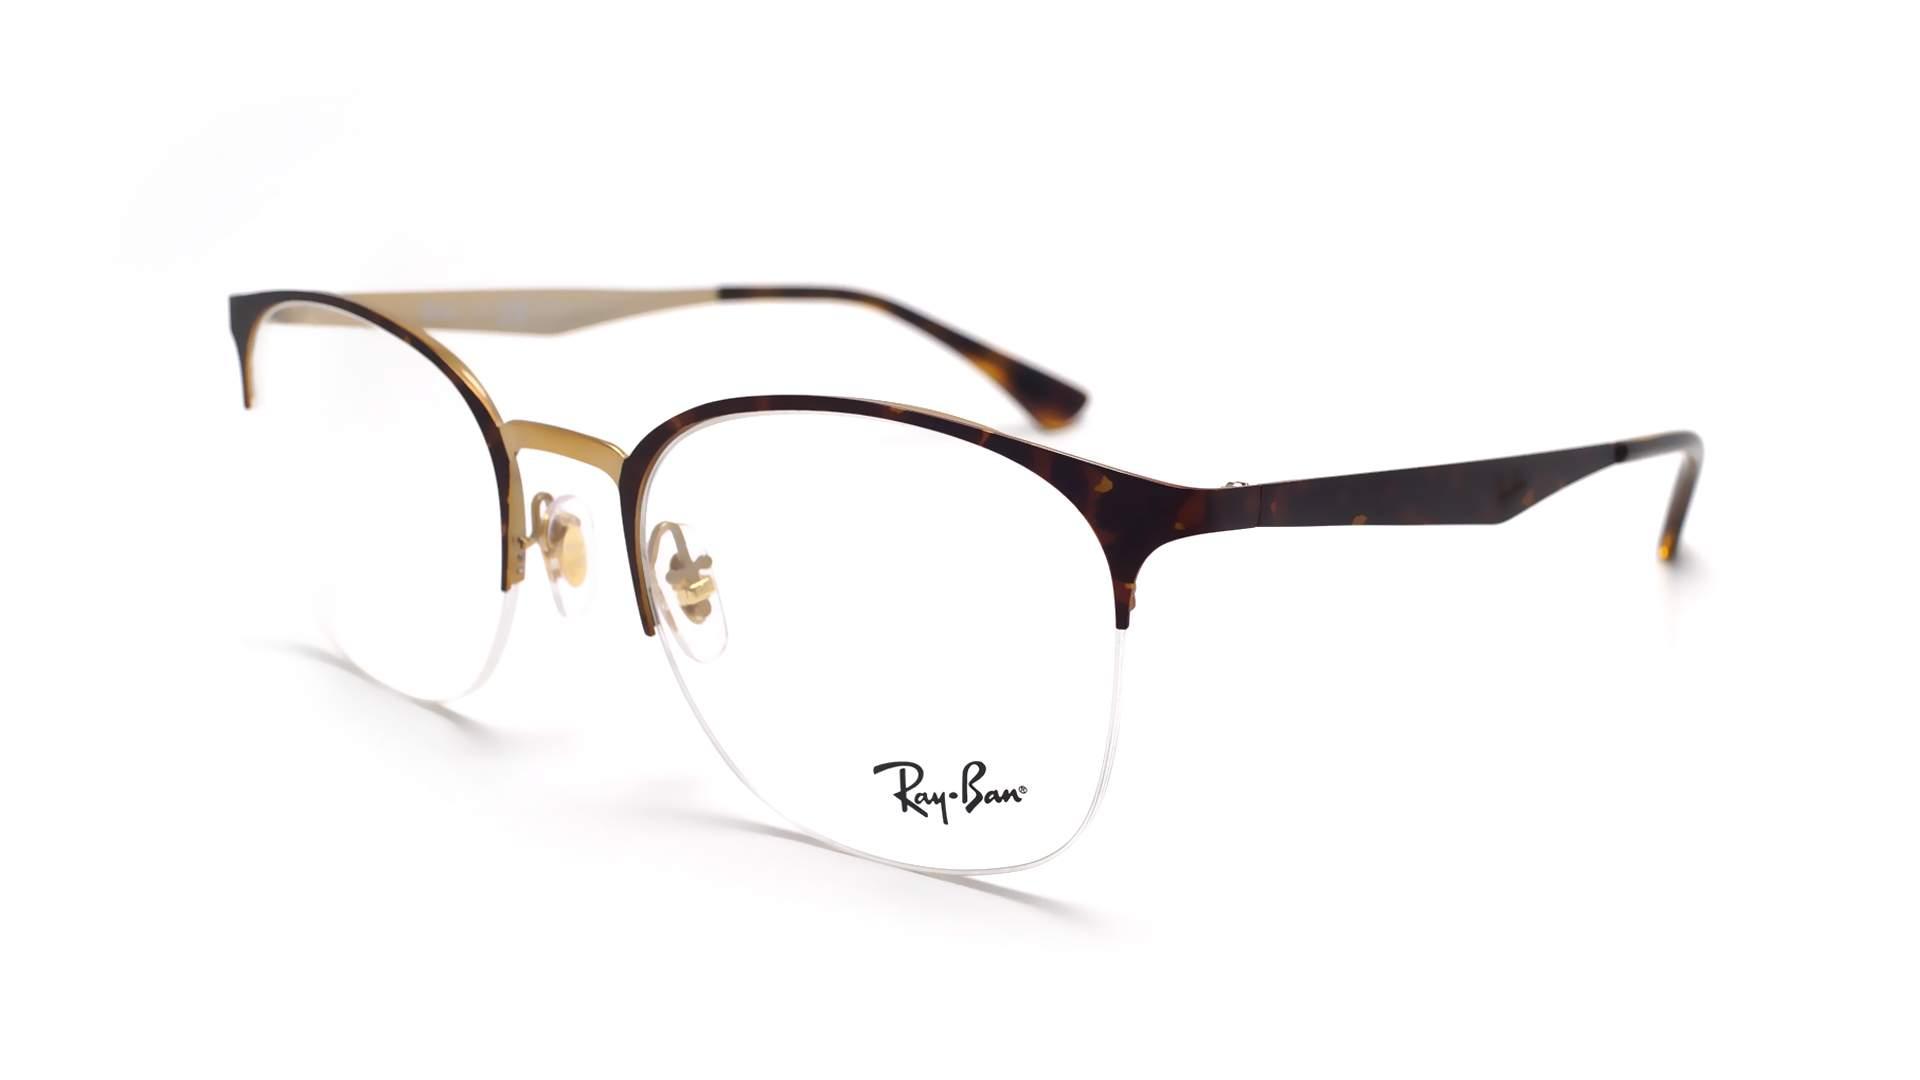 b1a98d3fb2e Eyeglasses Ray-Ban RX6422 RB6422 3001 49-19 Tortoise Matte Small